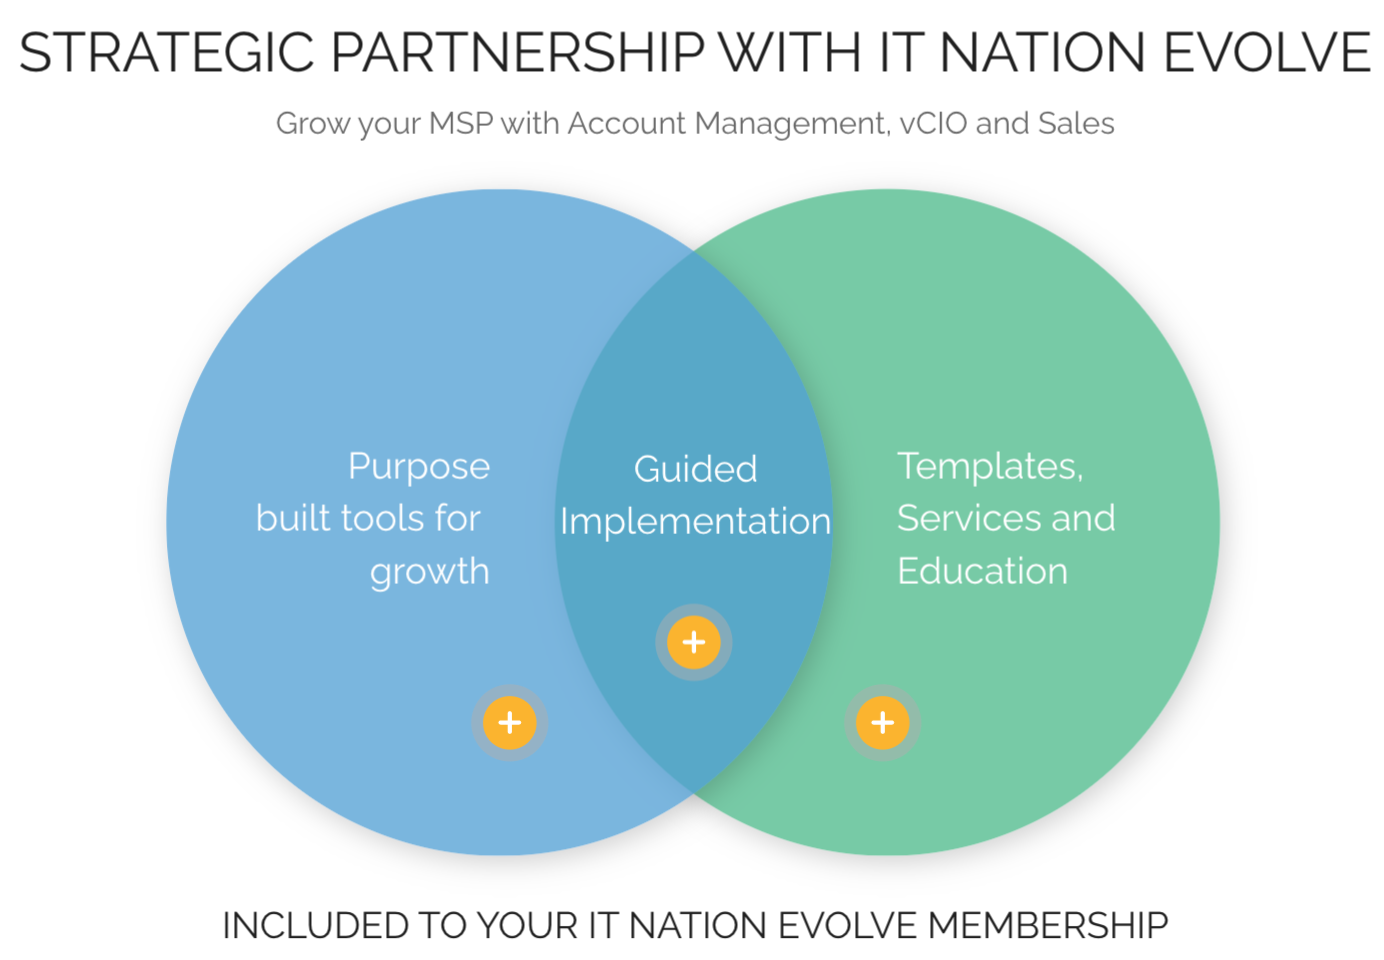 strategic-partnership-with-it-nation-evolve